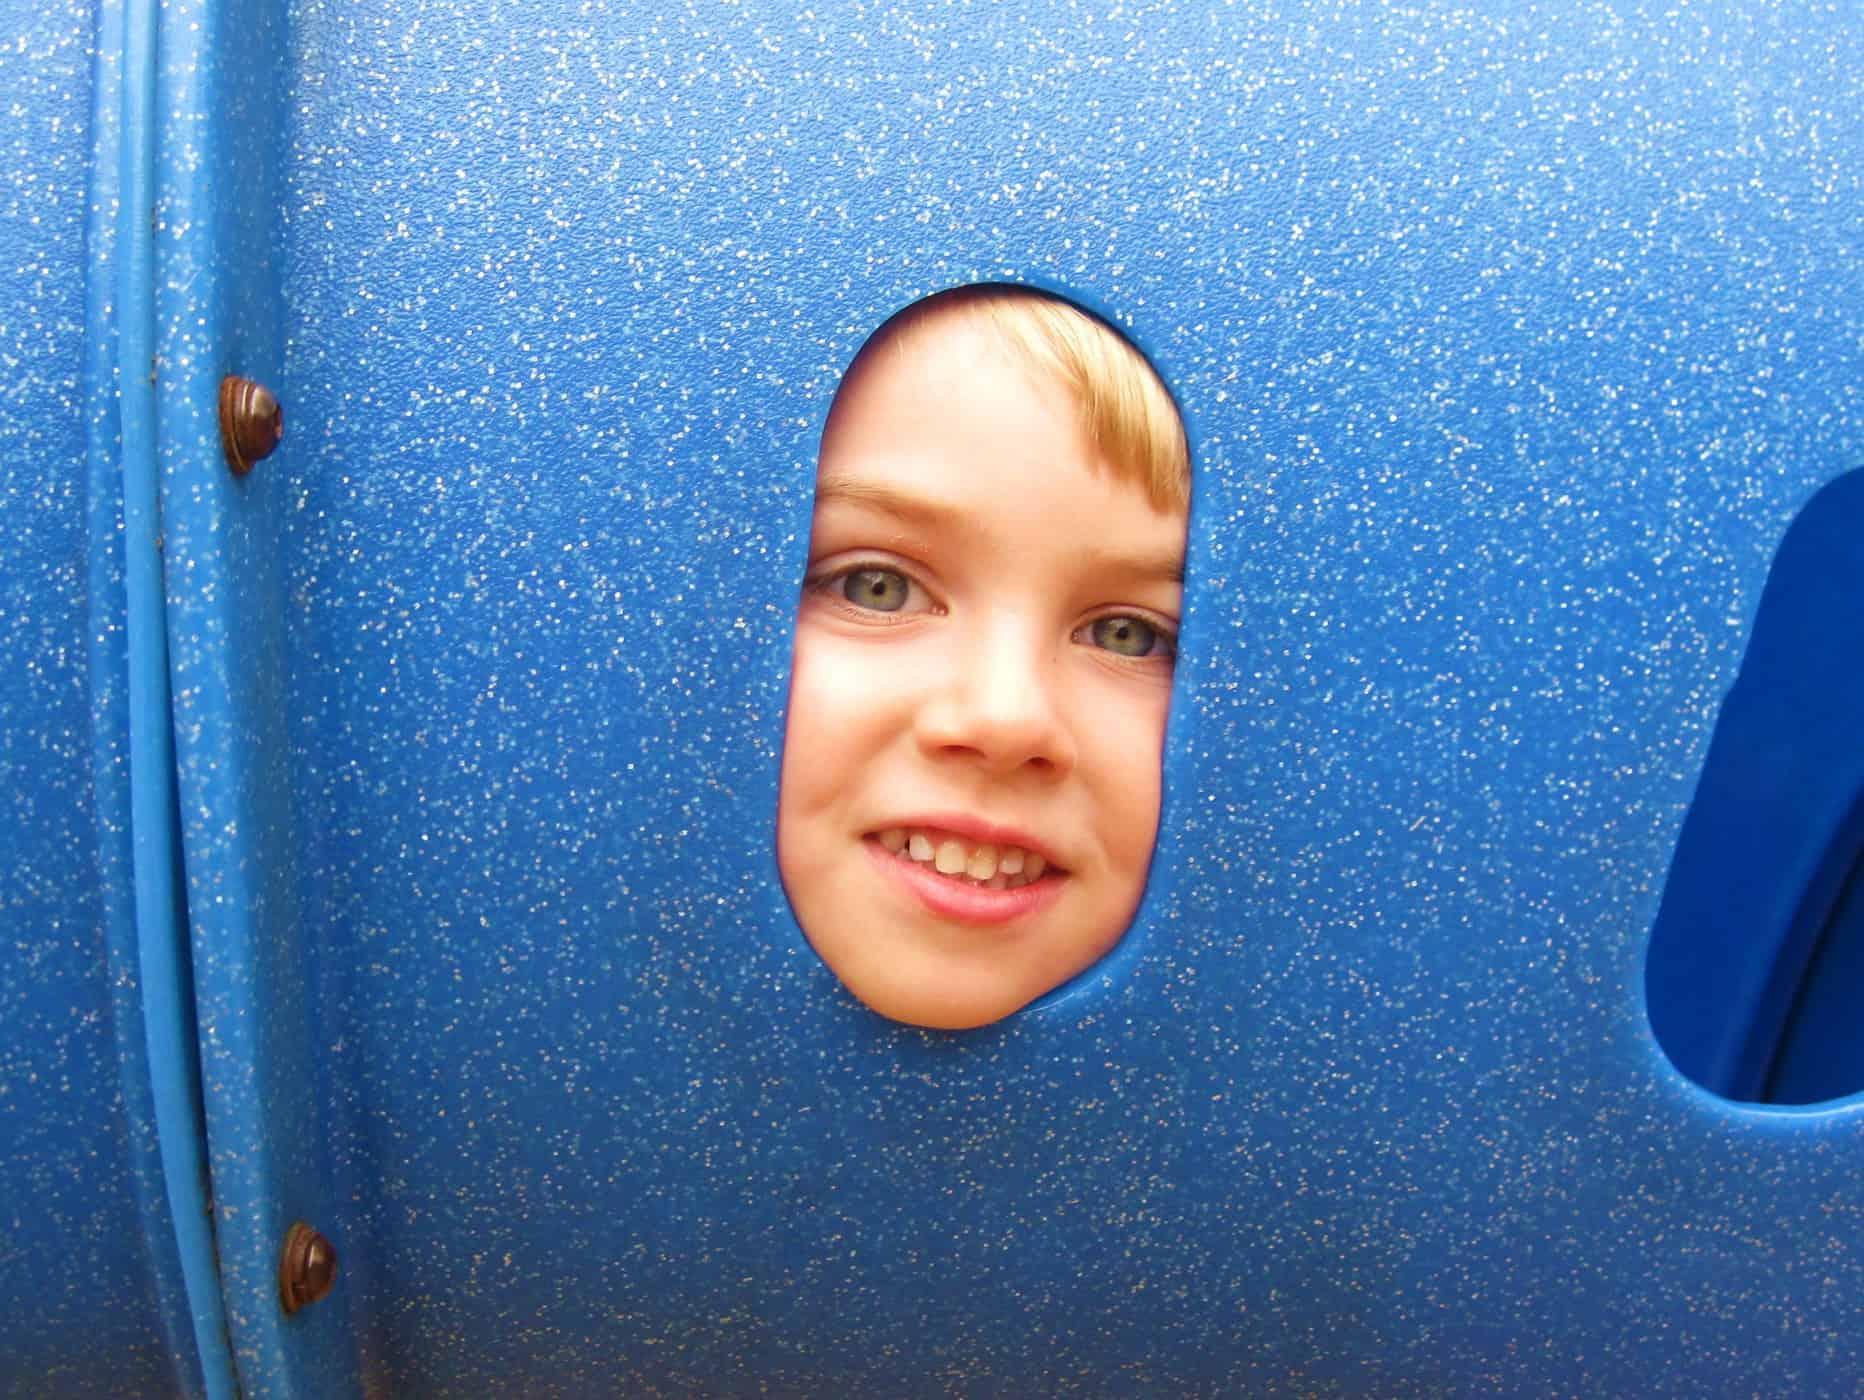 Wordless Wednesday — Blue Boy